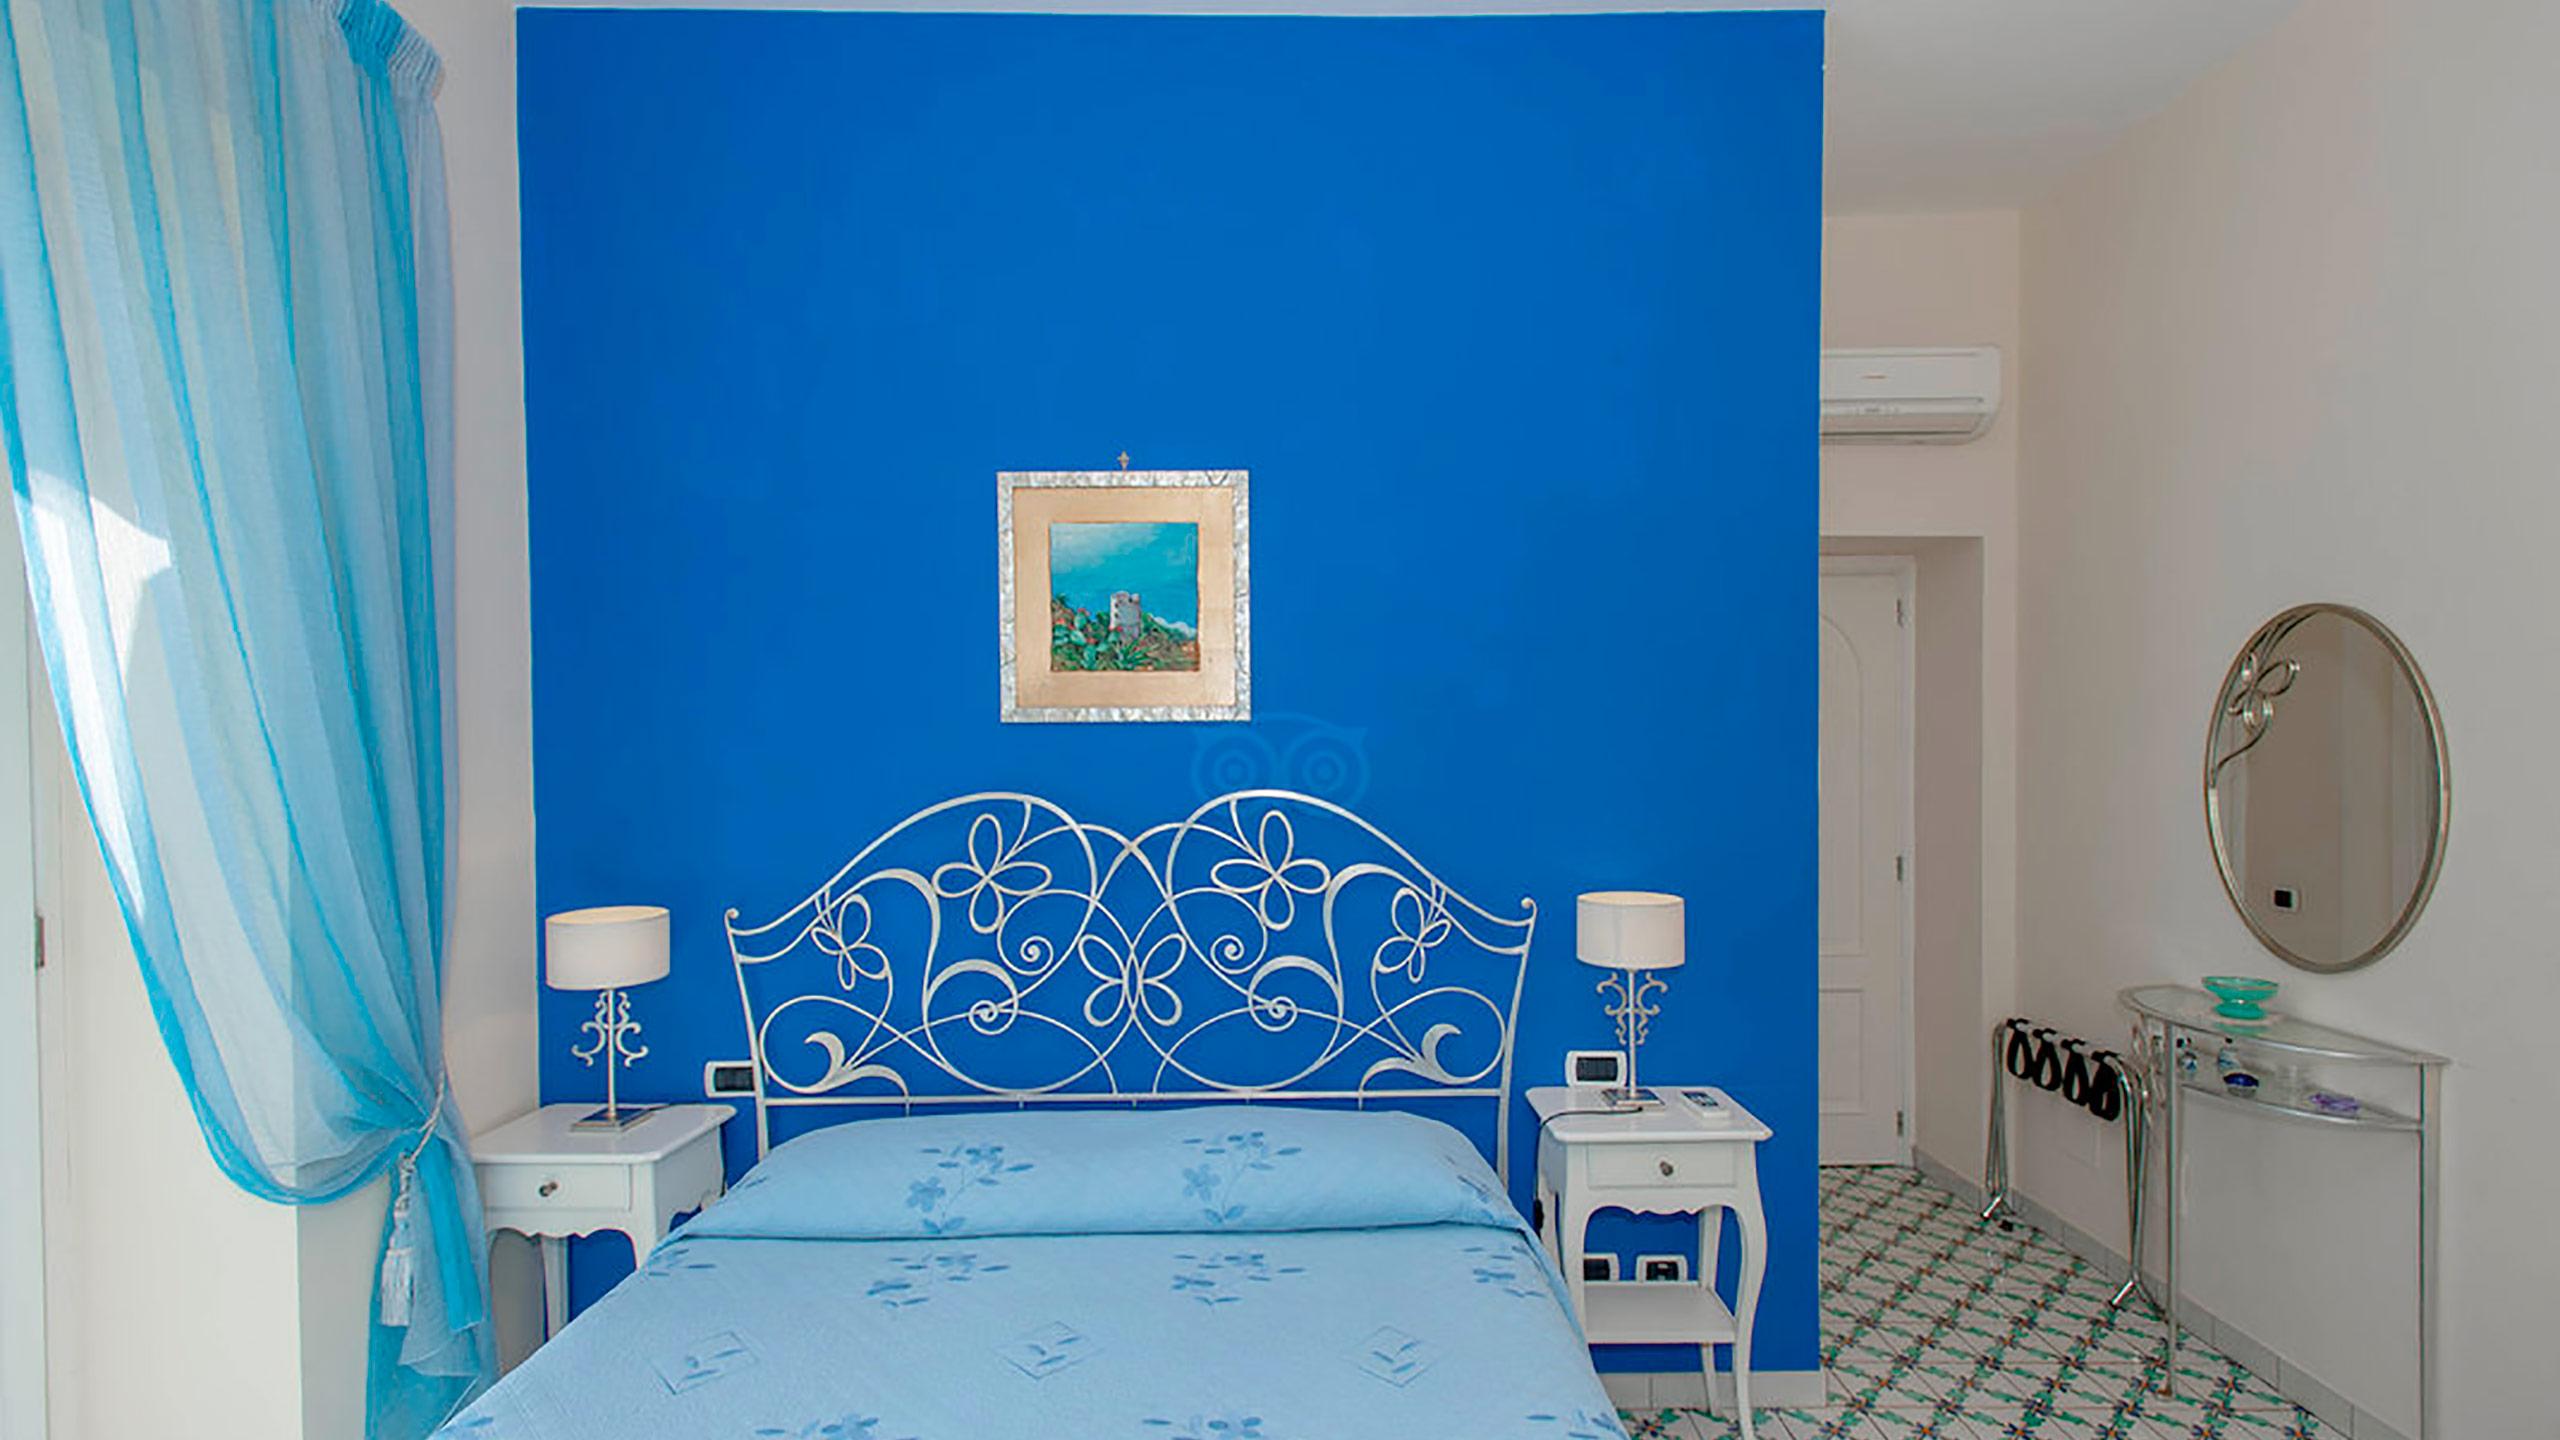 la-rondine-room--v10056894